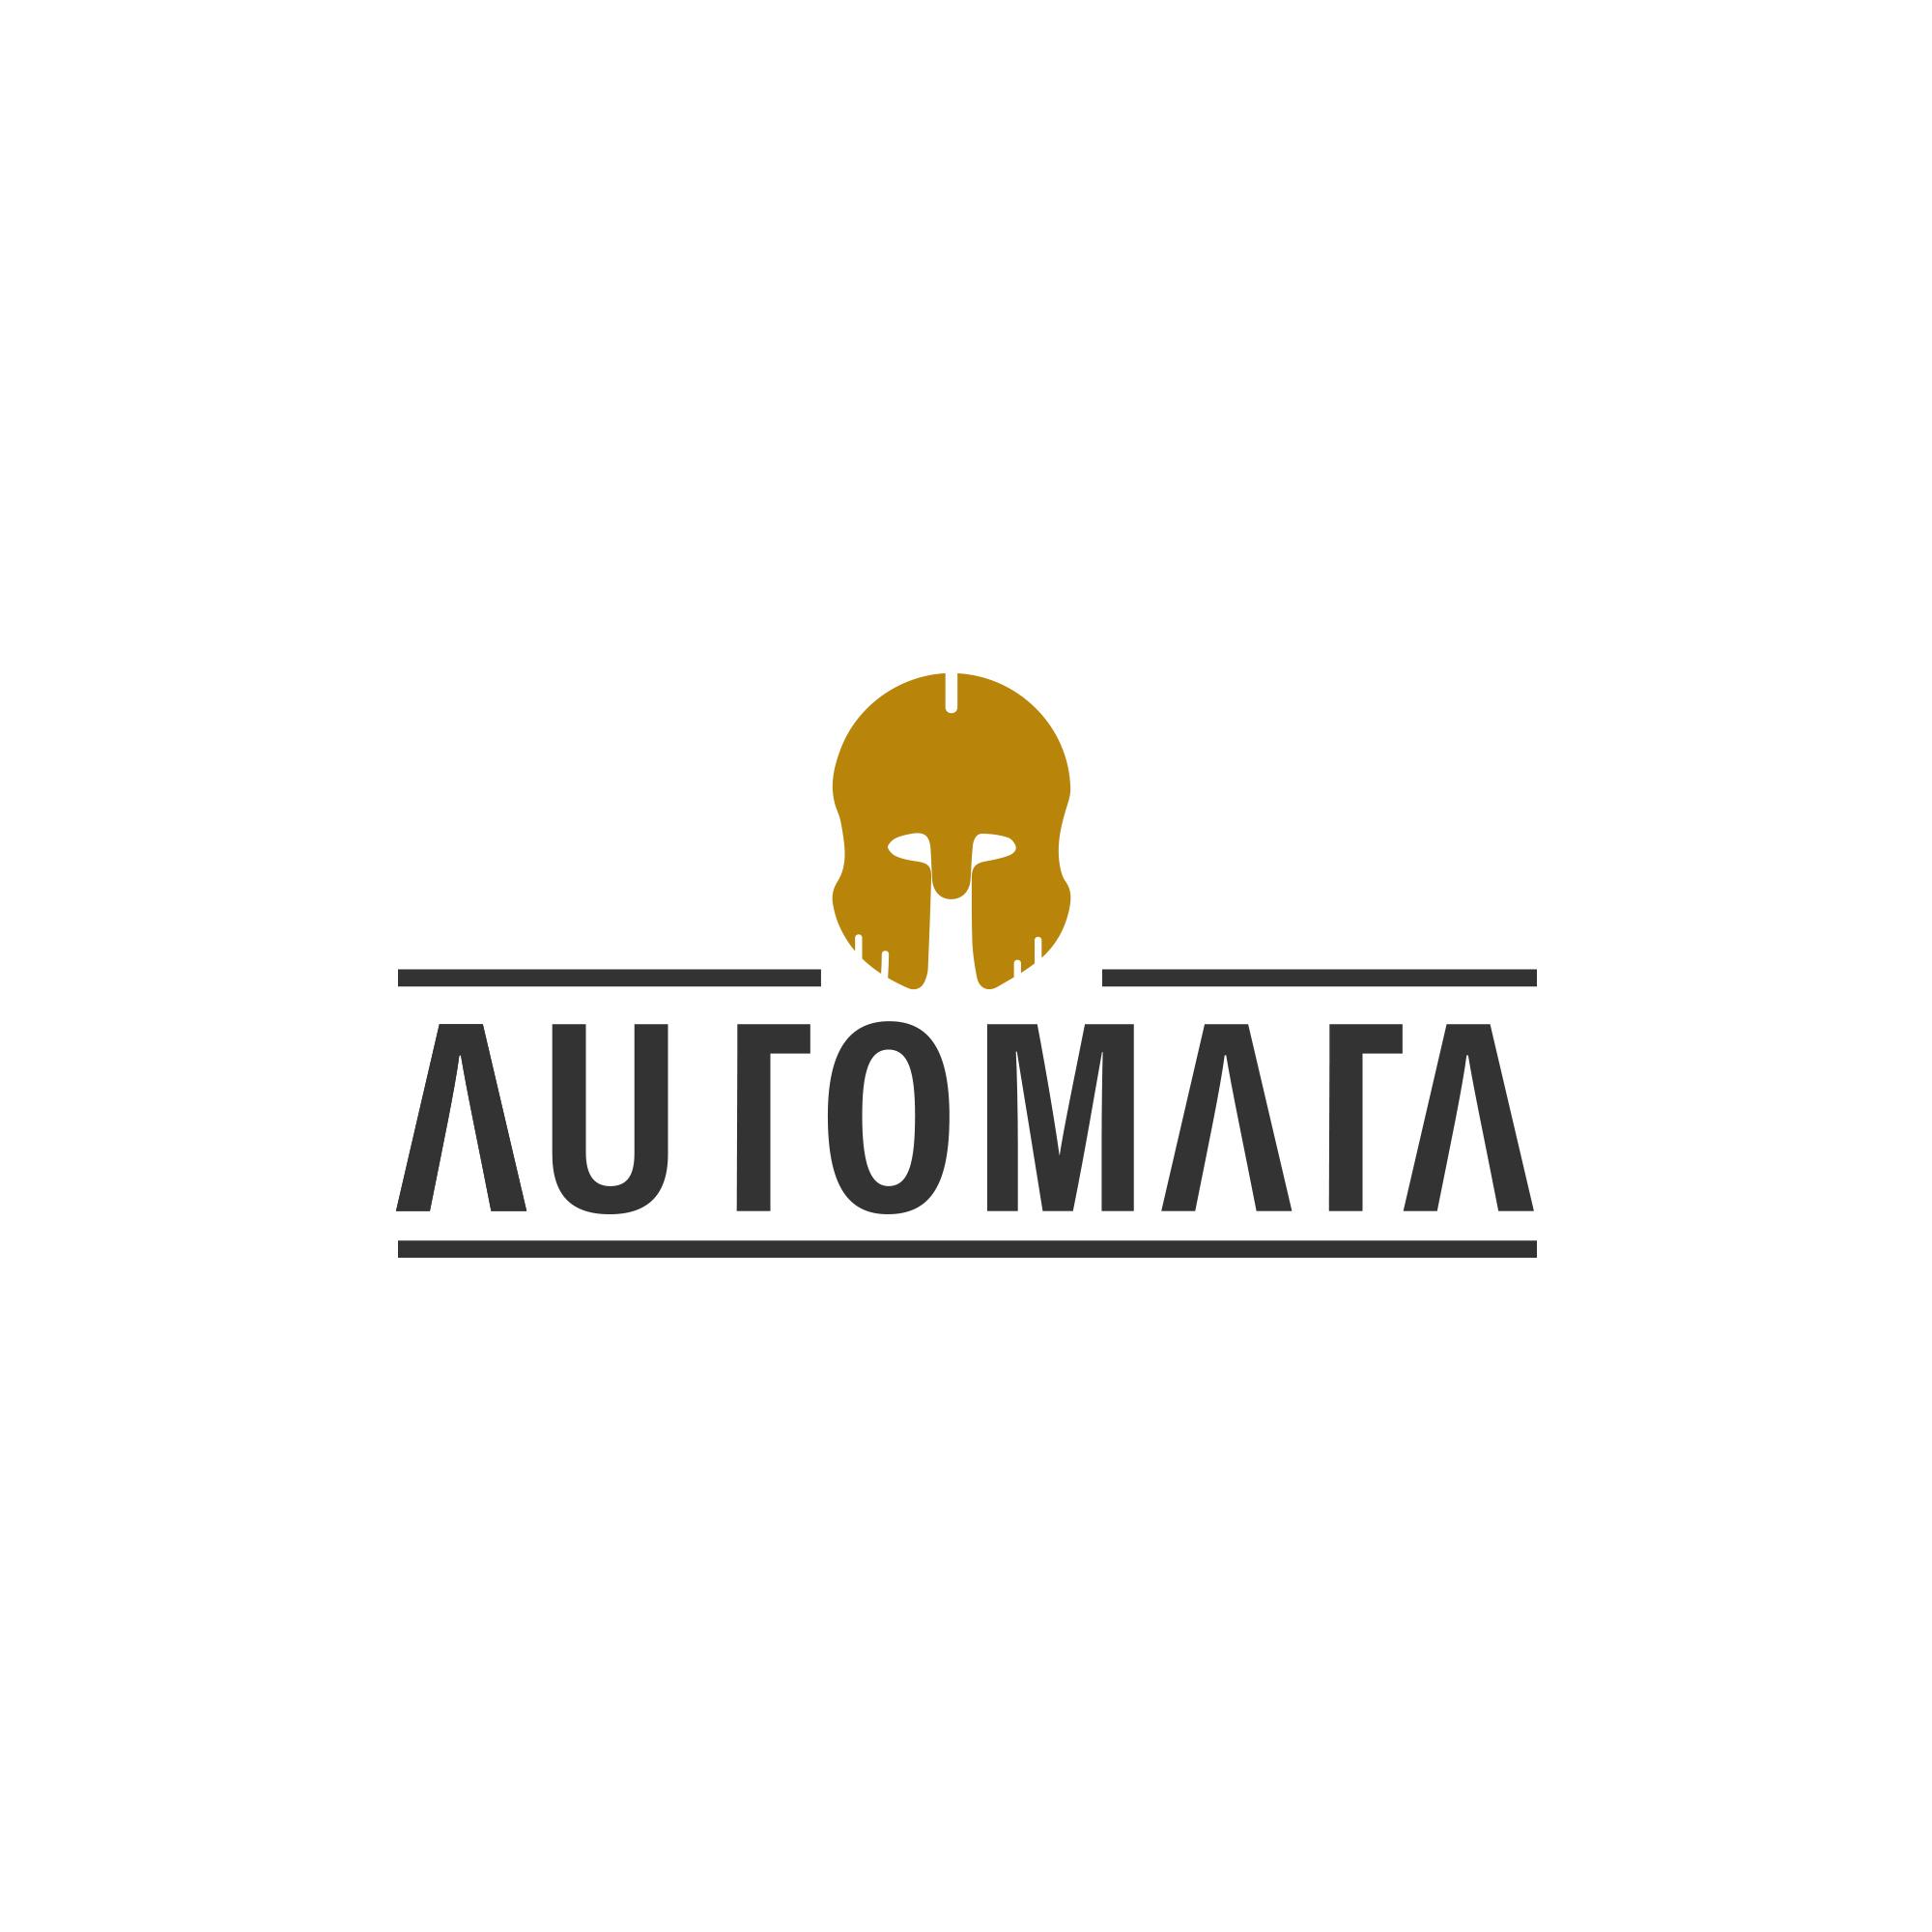 Automata, a chatbot developer